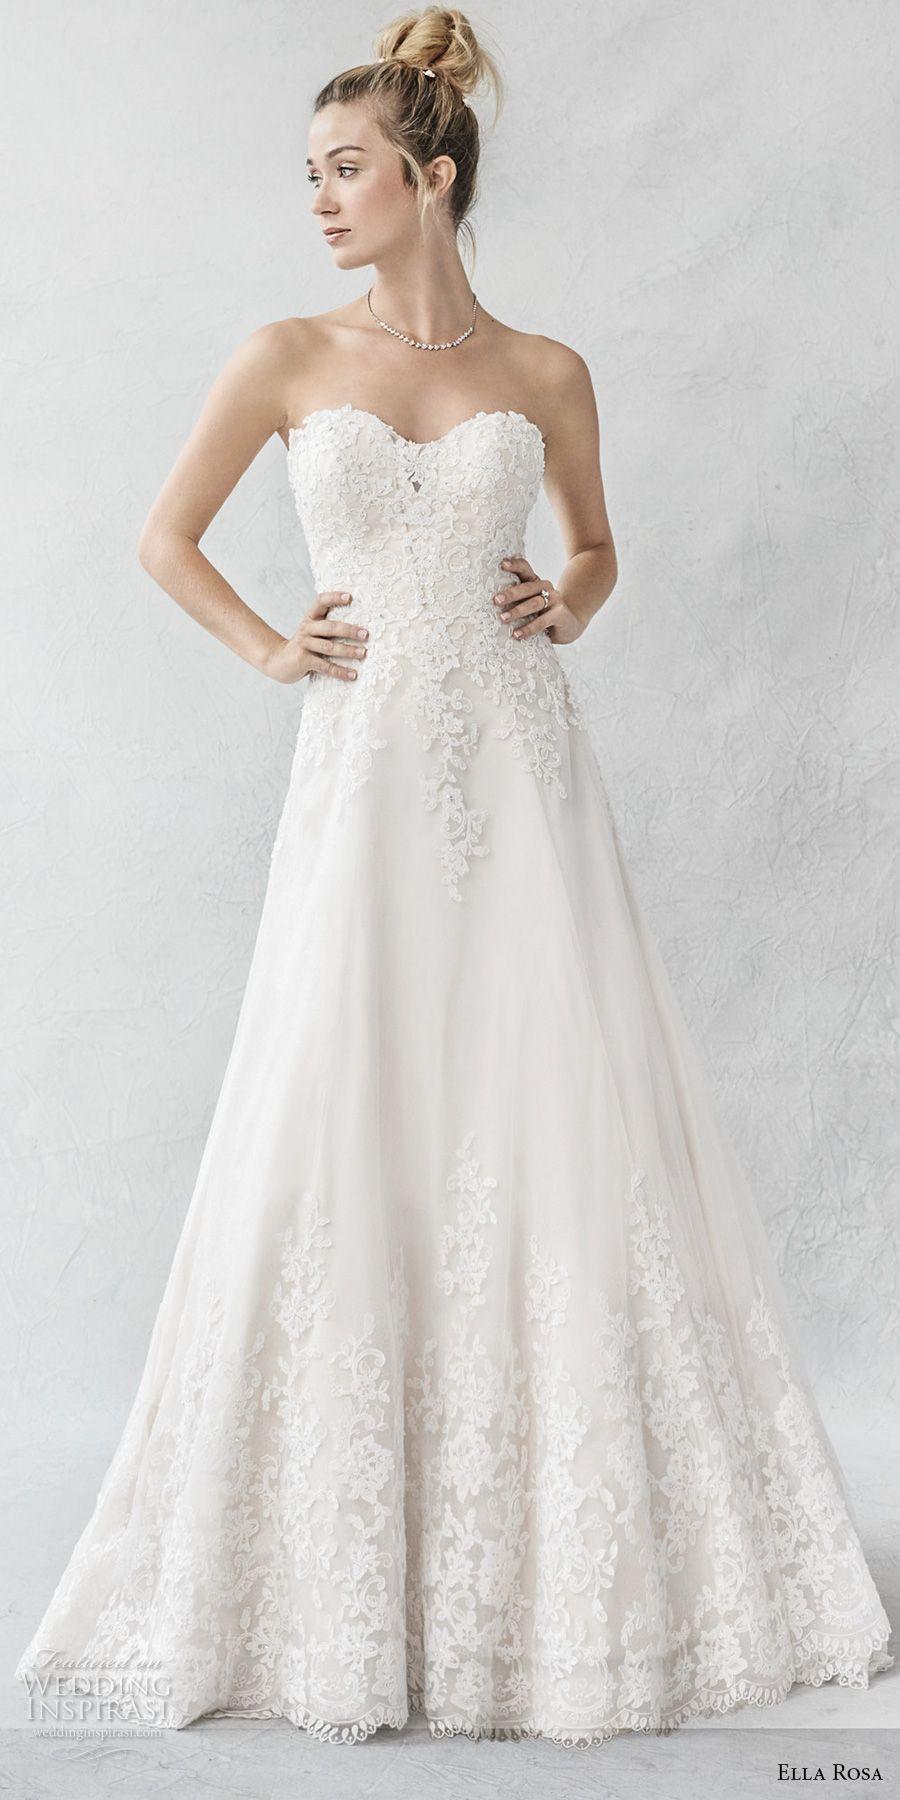 Ella Rosa Spring 2017 Wedding Dresses | Chapel train, Bodice and ...